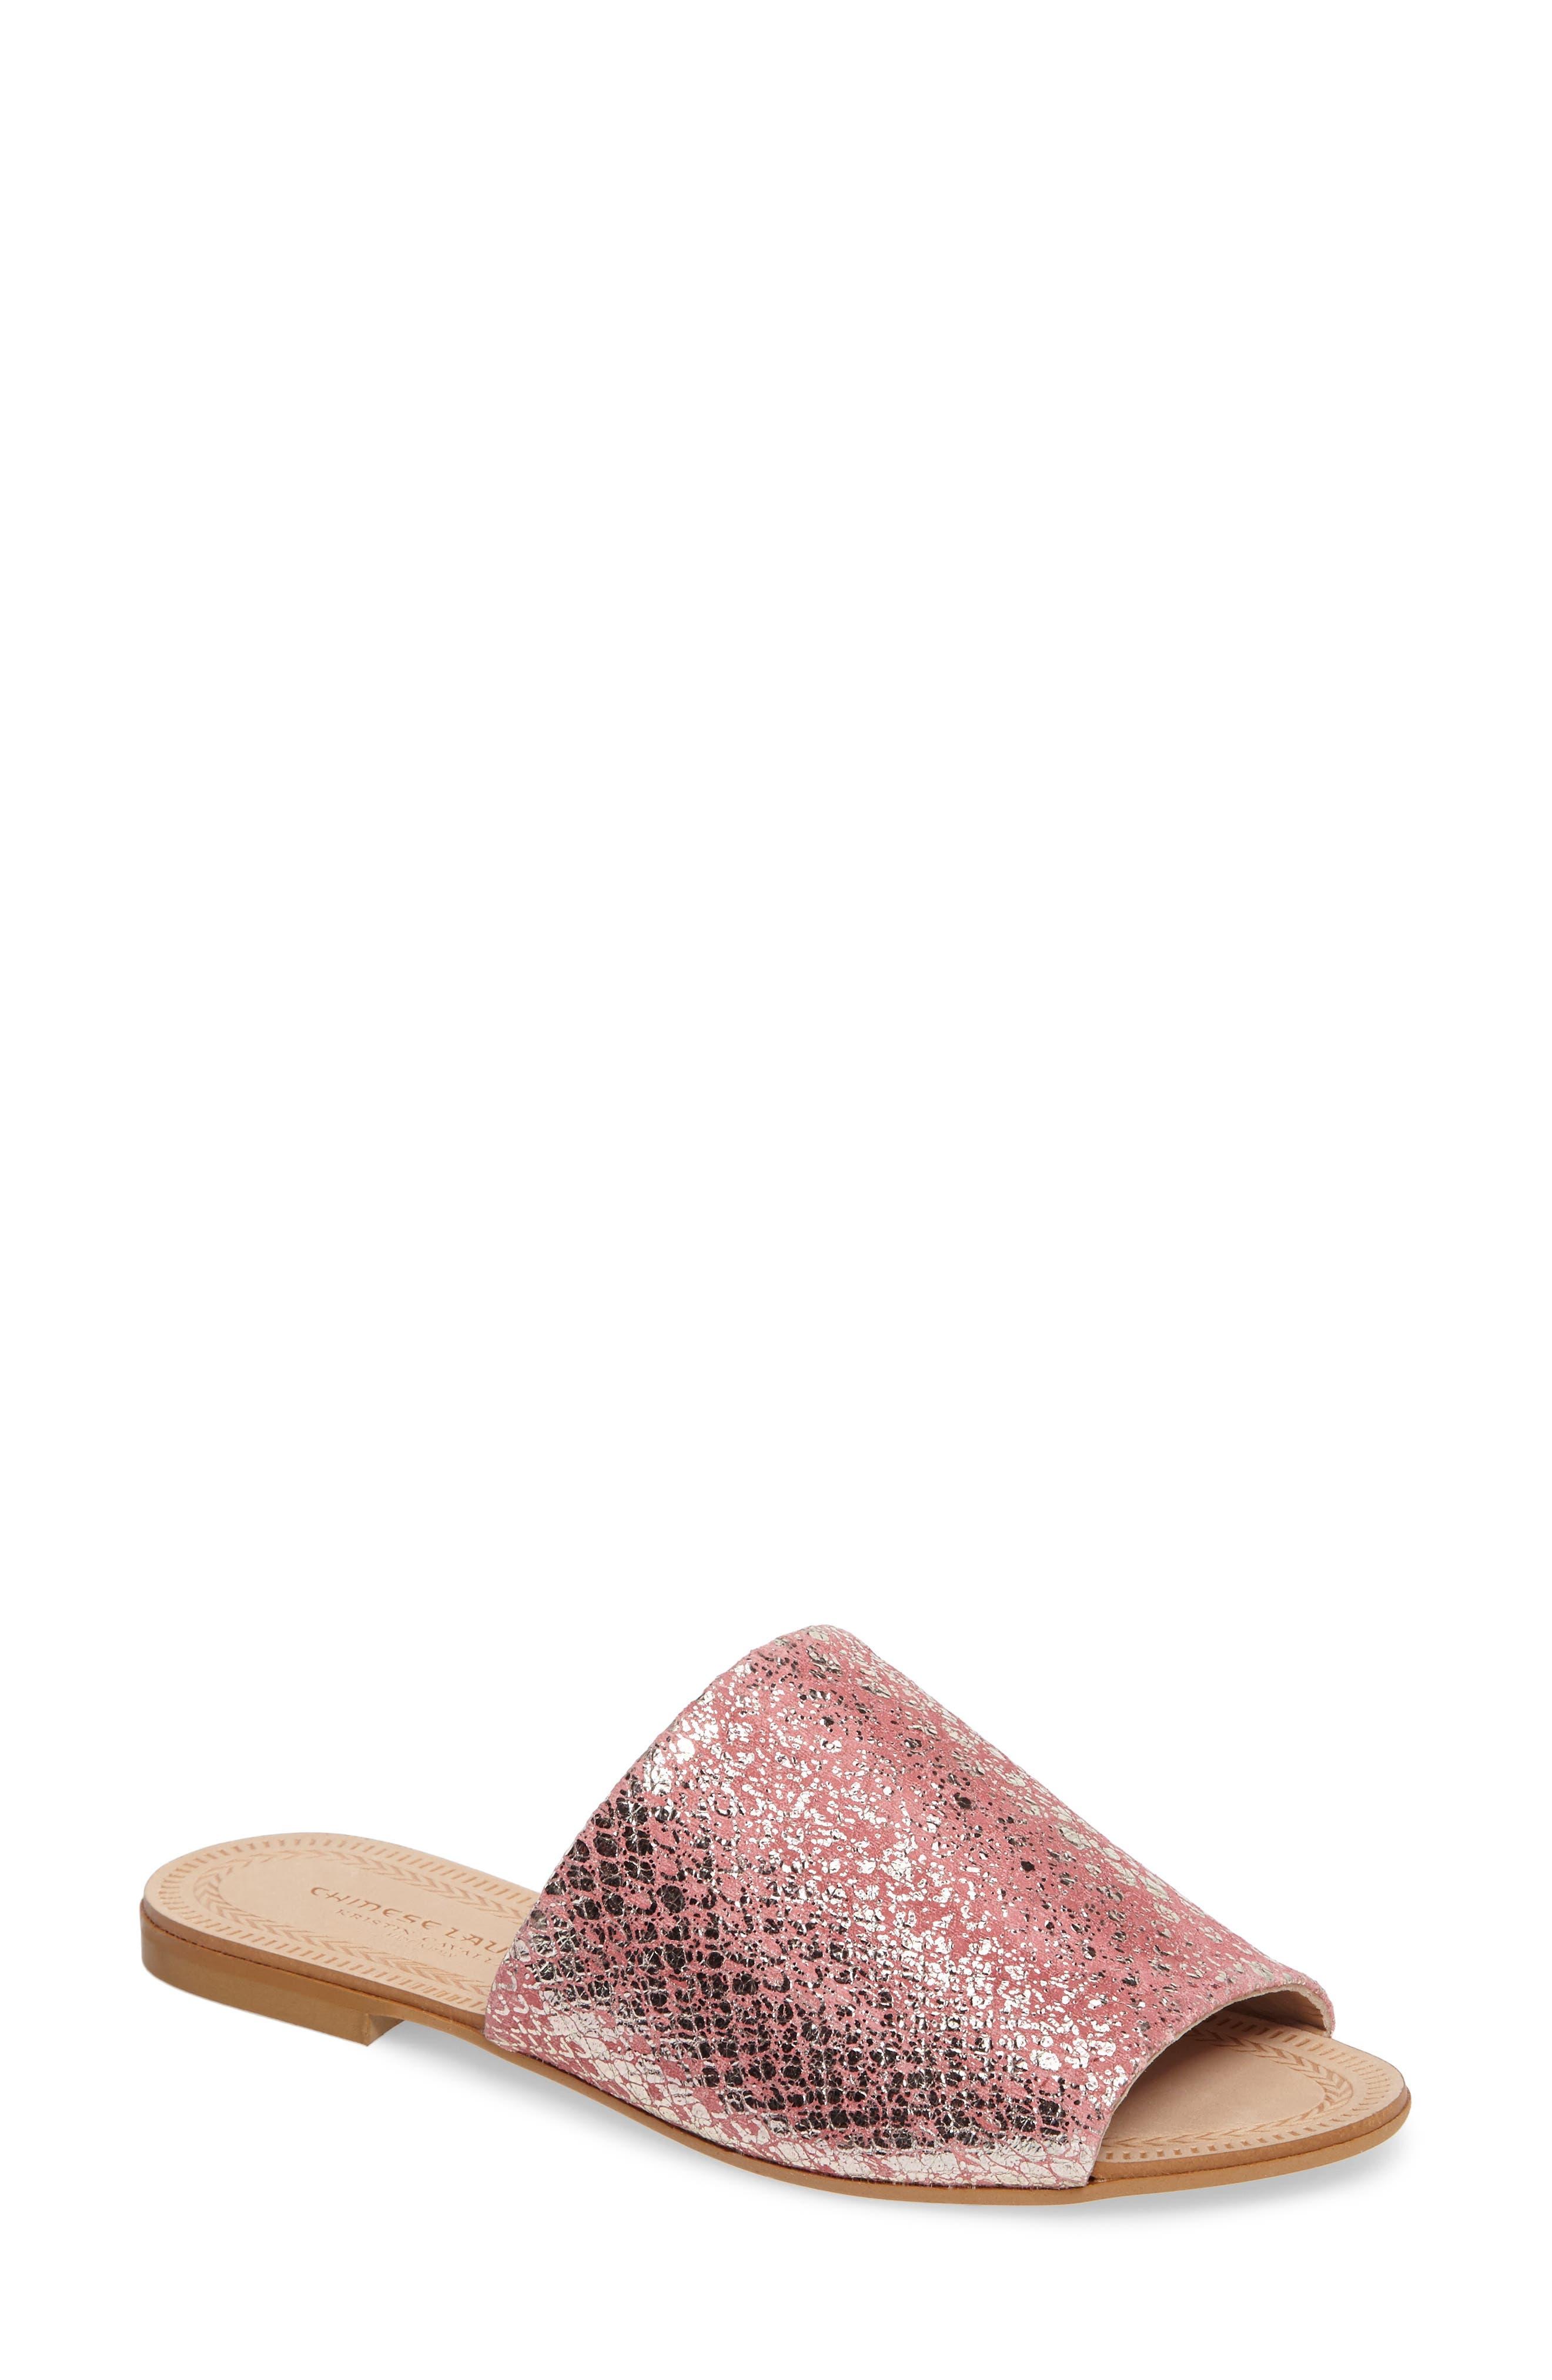 Kristin Cavallari Bahiti Open Toe Slide (Women)